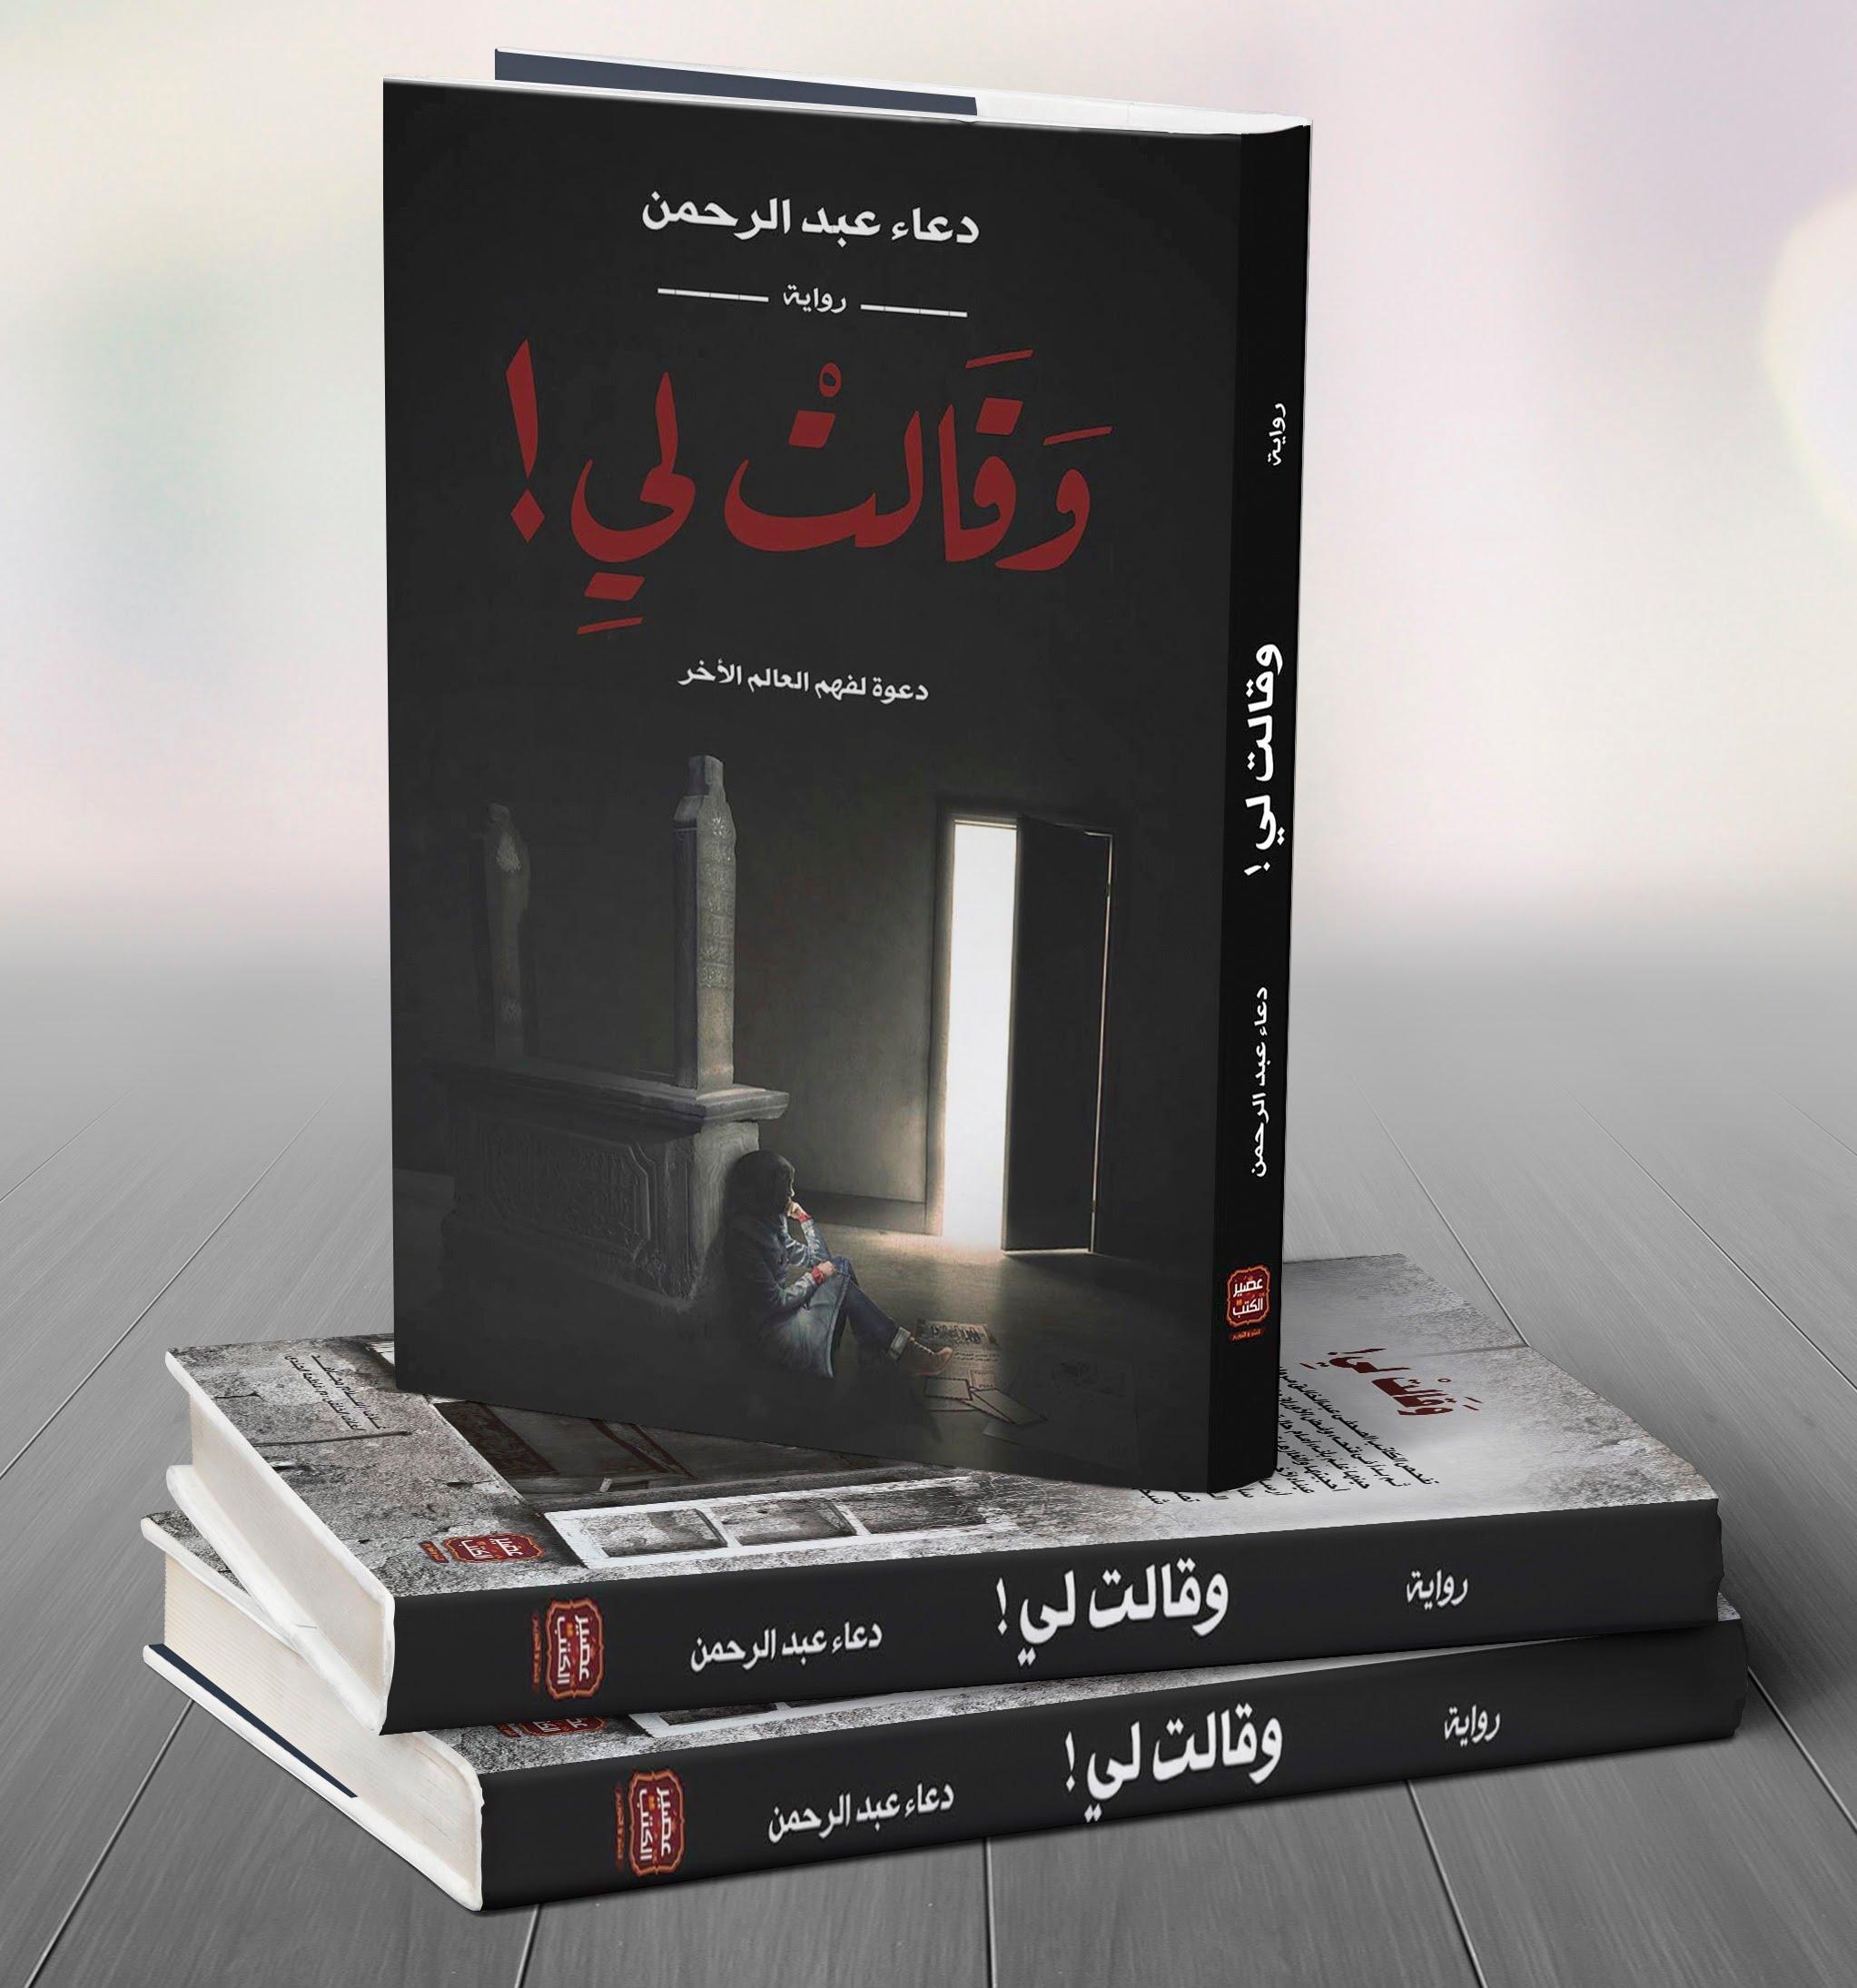 بالصور روايات دعاء عبد الرحمن , اجمل كتب دعاء عبد الرحمن 5492 7